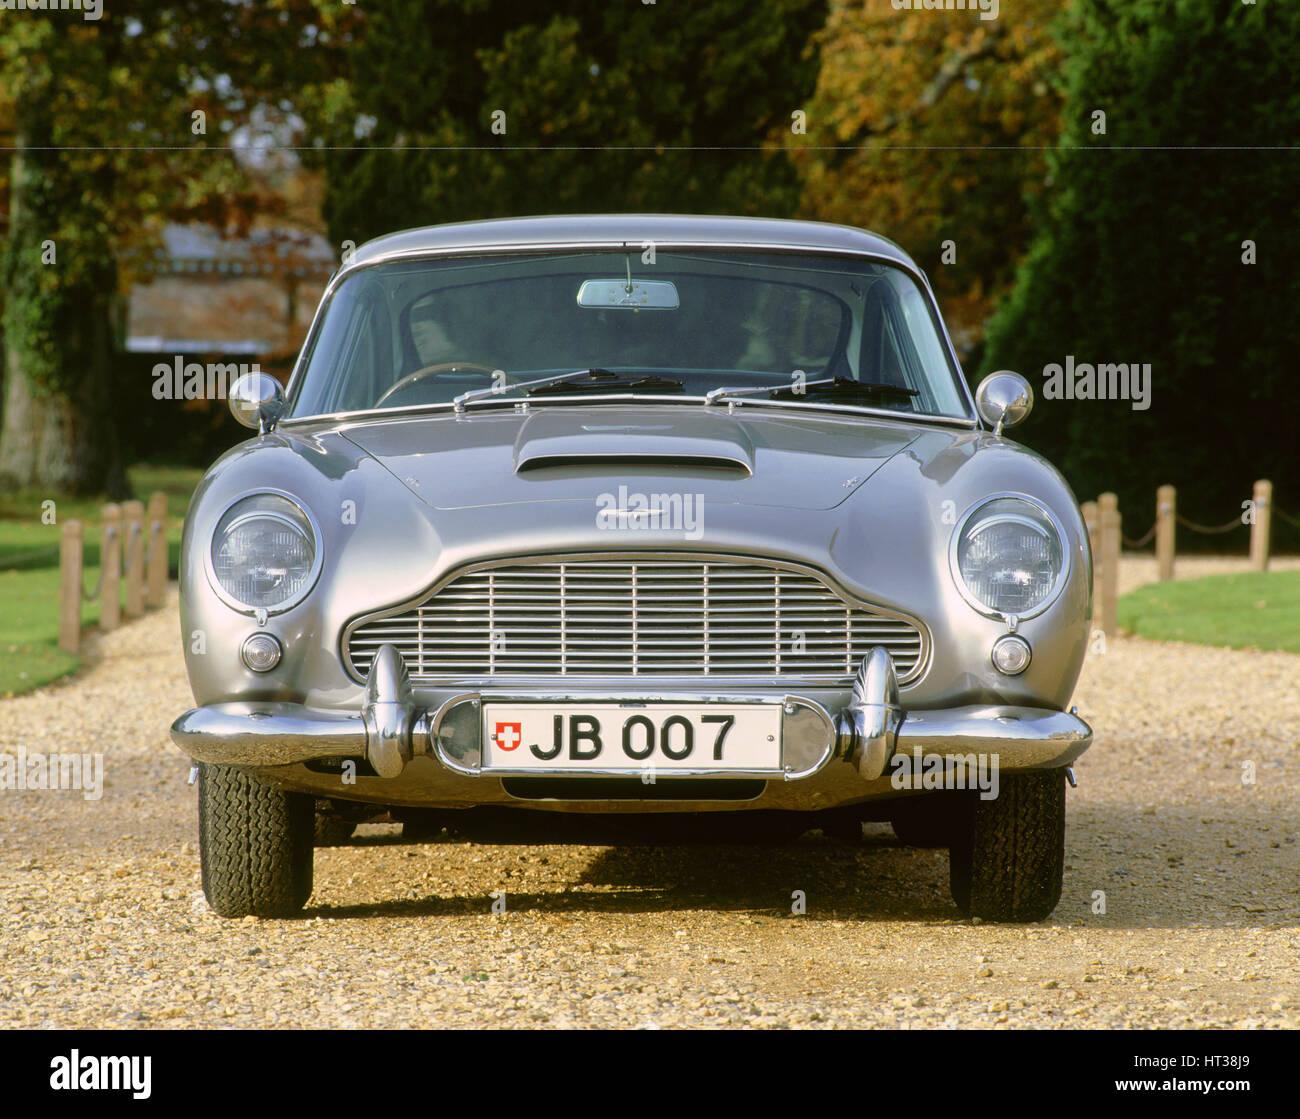 1965 Aston Martin DB5, James Bond. Artiste: Inconnu. Photo Stock